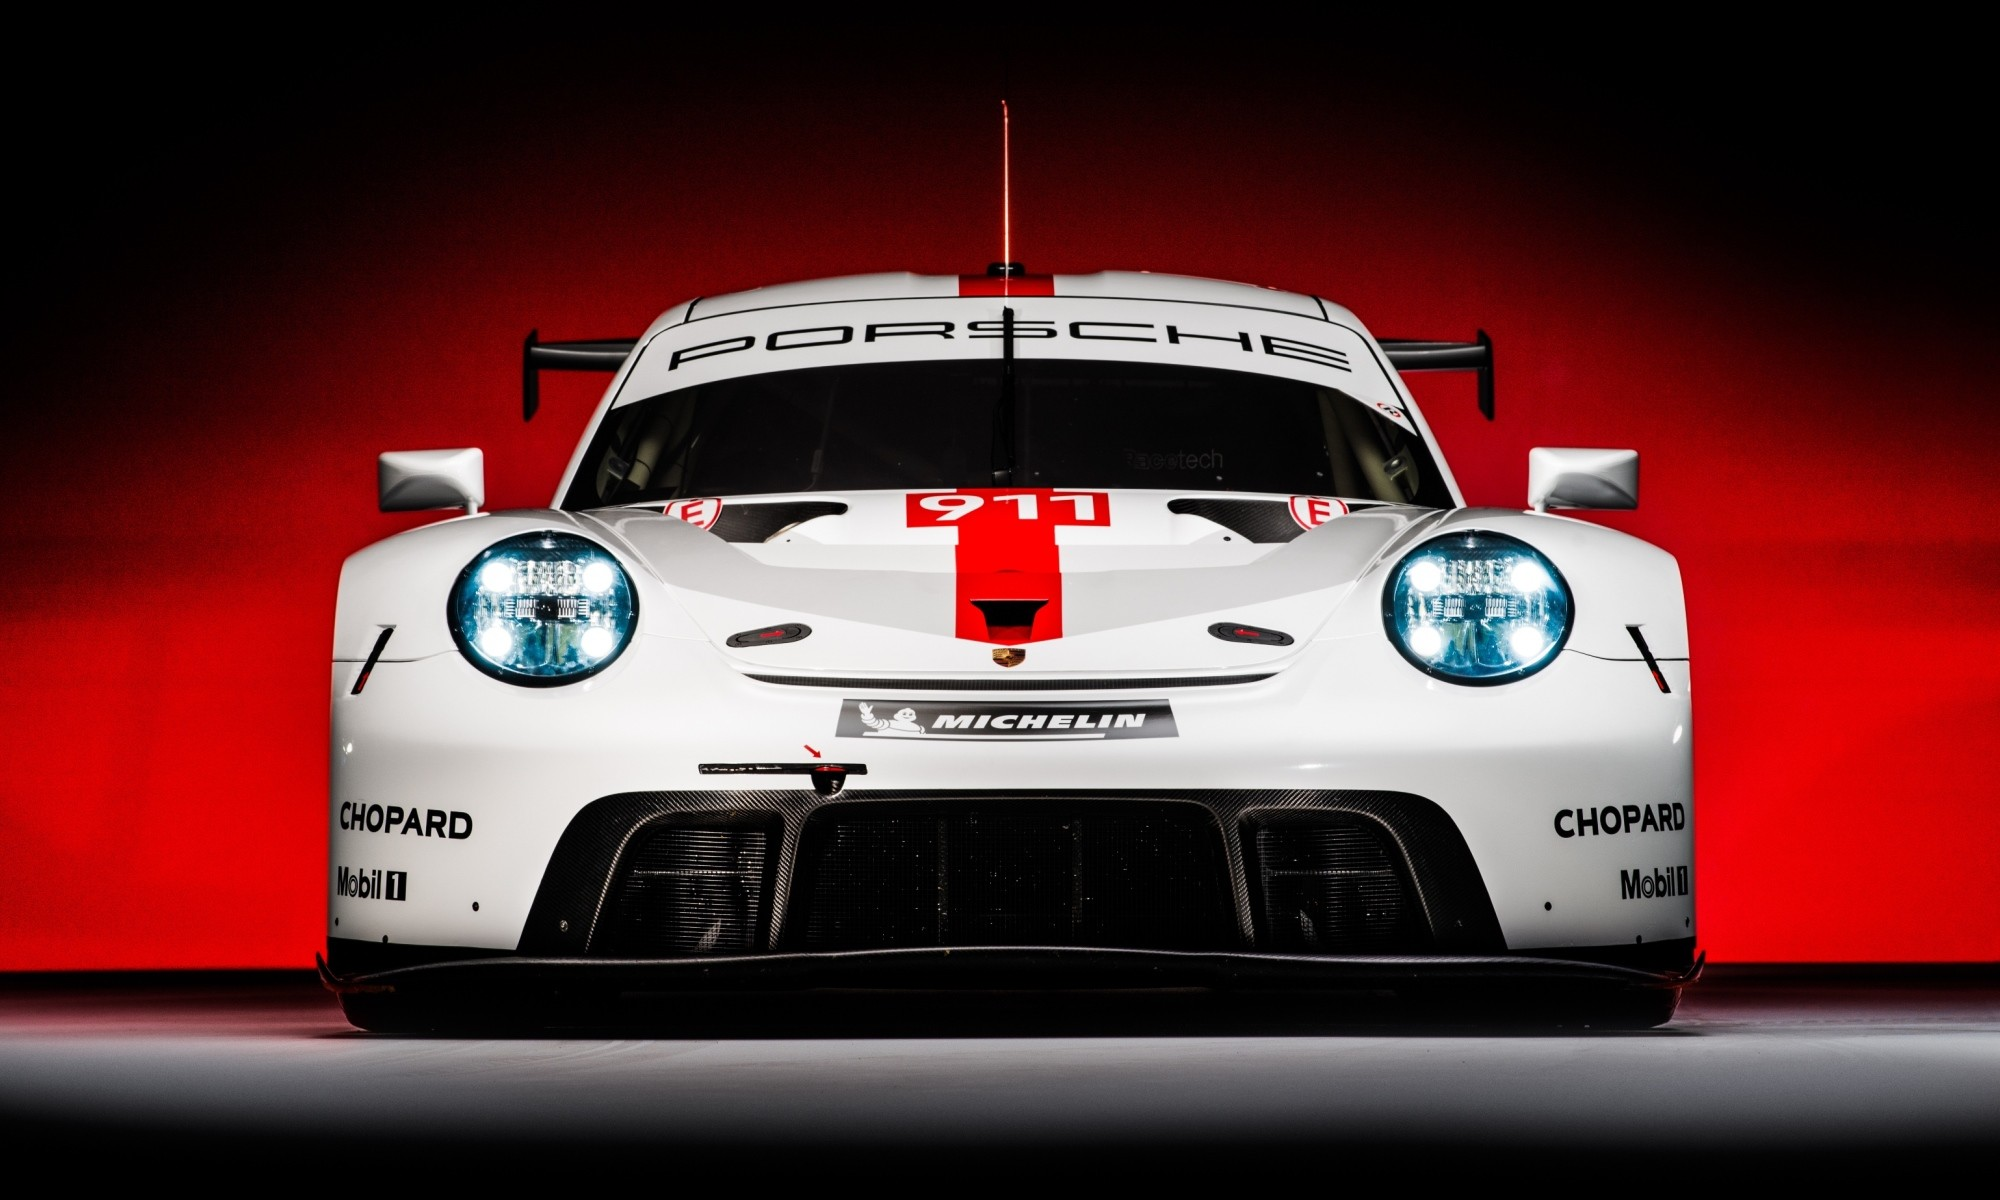 Porsche 911 RSR front